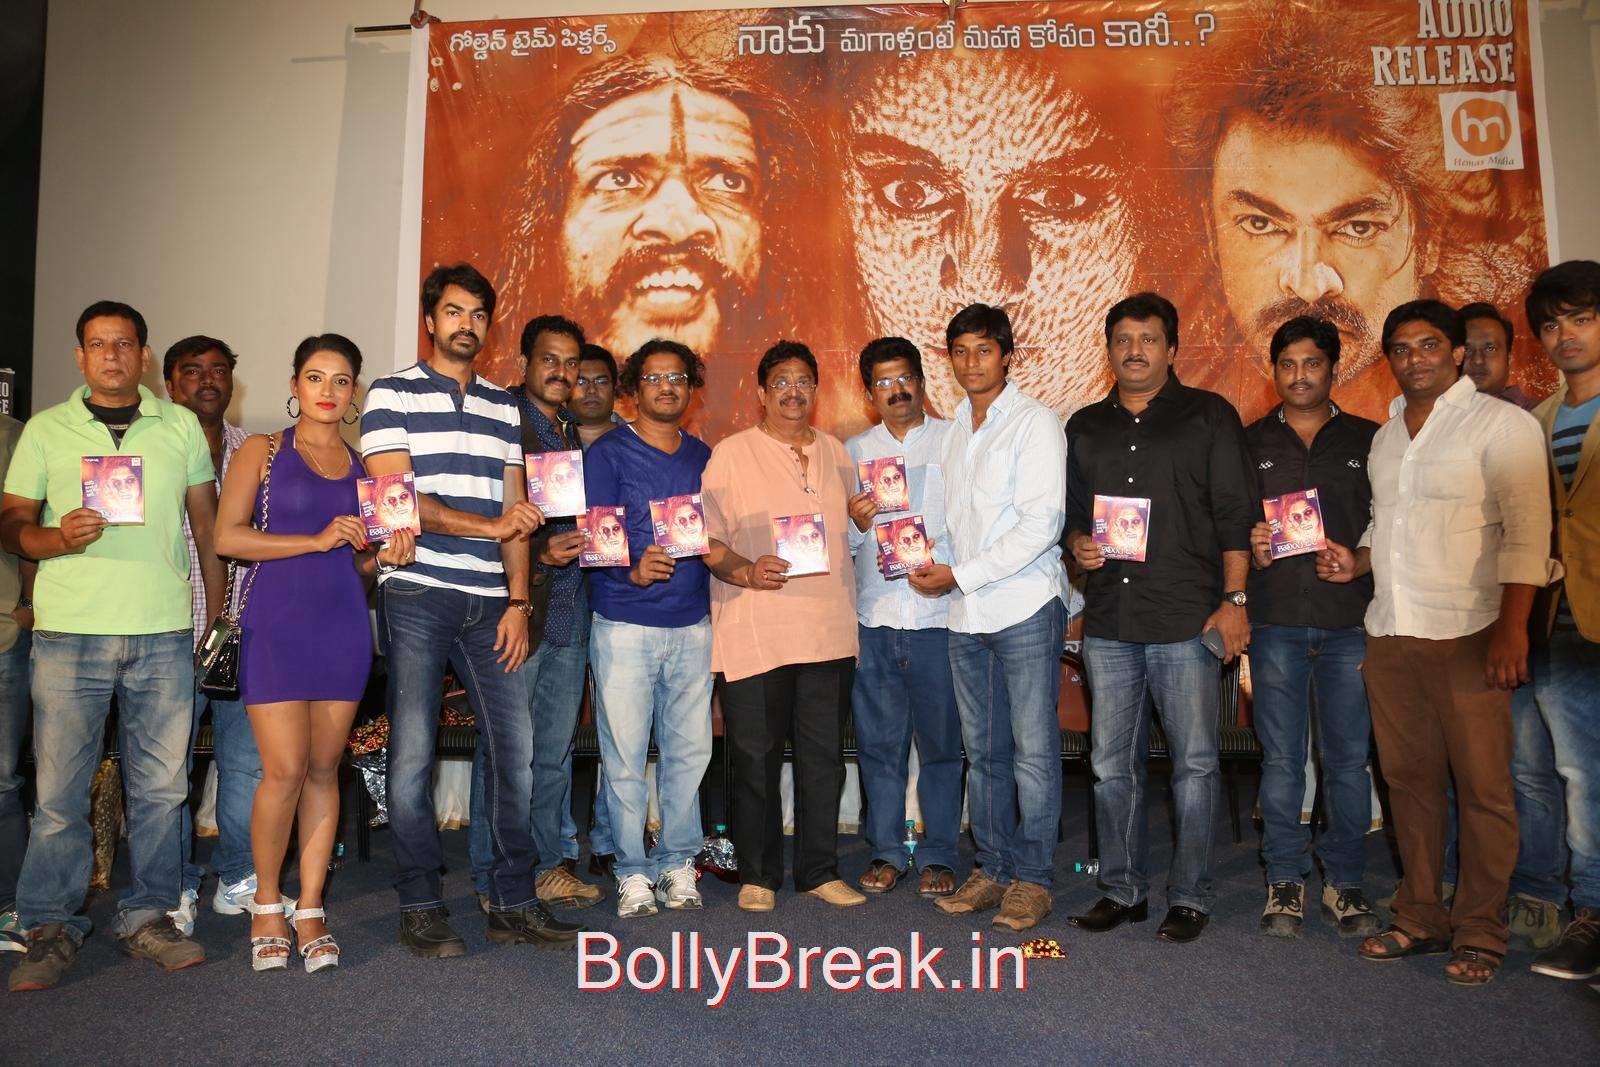 Ravi Varma-Calling Bell Movie Audio Launch Pics, Lucky, Vriti Khanna,Mamatha Rahuth Hot Pics From Calling Bell Movie Audio Launch